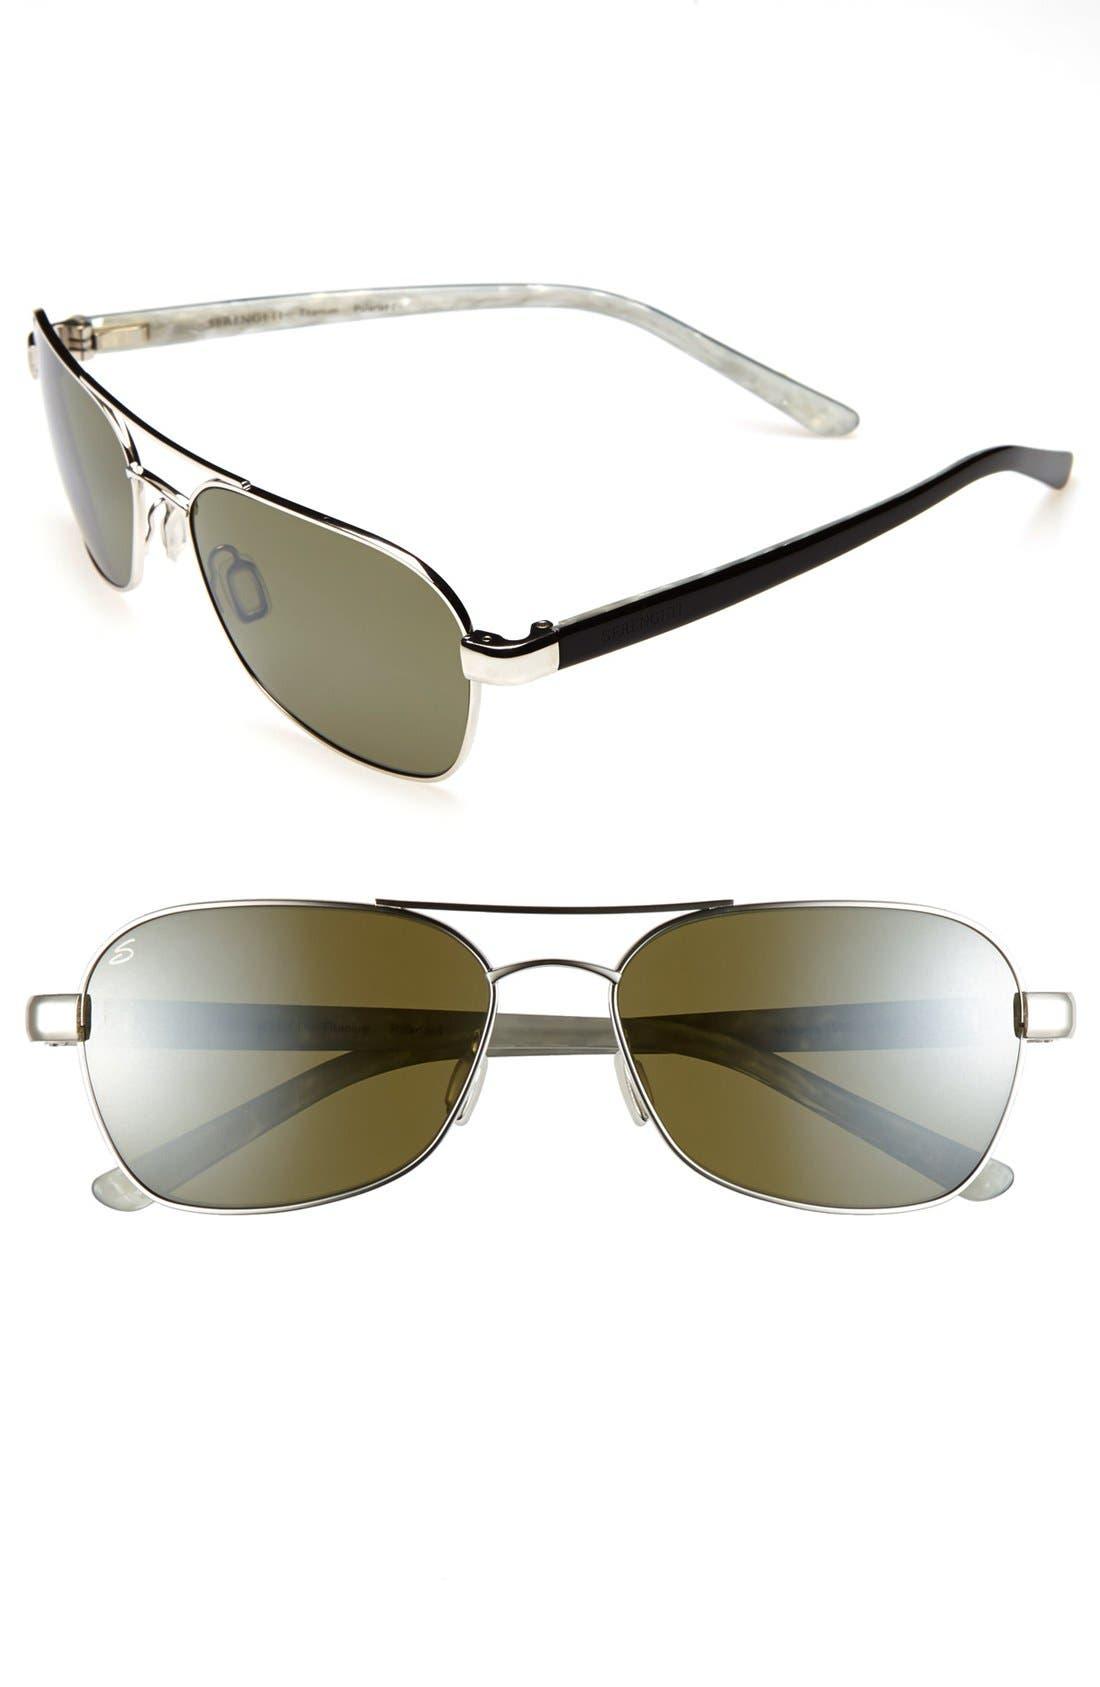 Main Image - Serengeti 'Volterra' 61mm Polarized Titanium Sunglasses